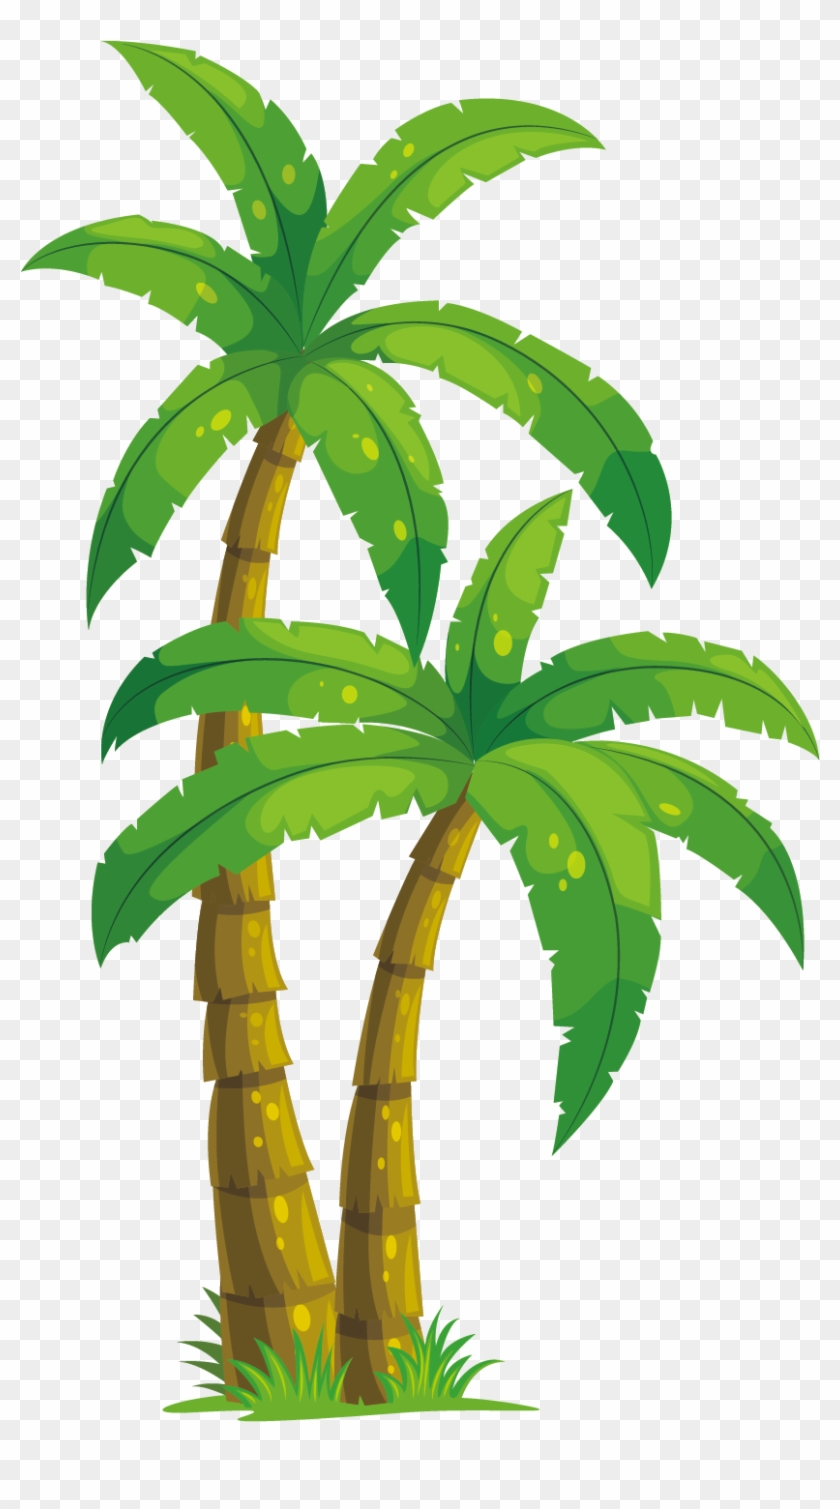 Arecaceae Coconut Tree Illustration - Animated Palm Tree Png #789729